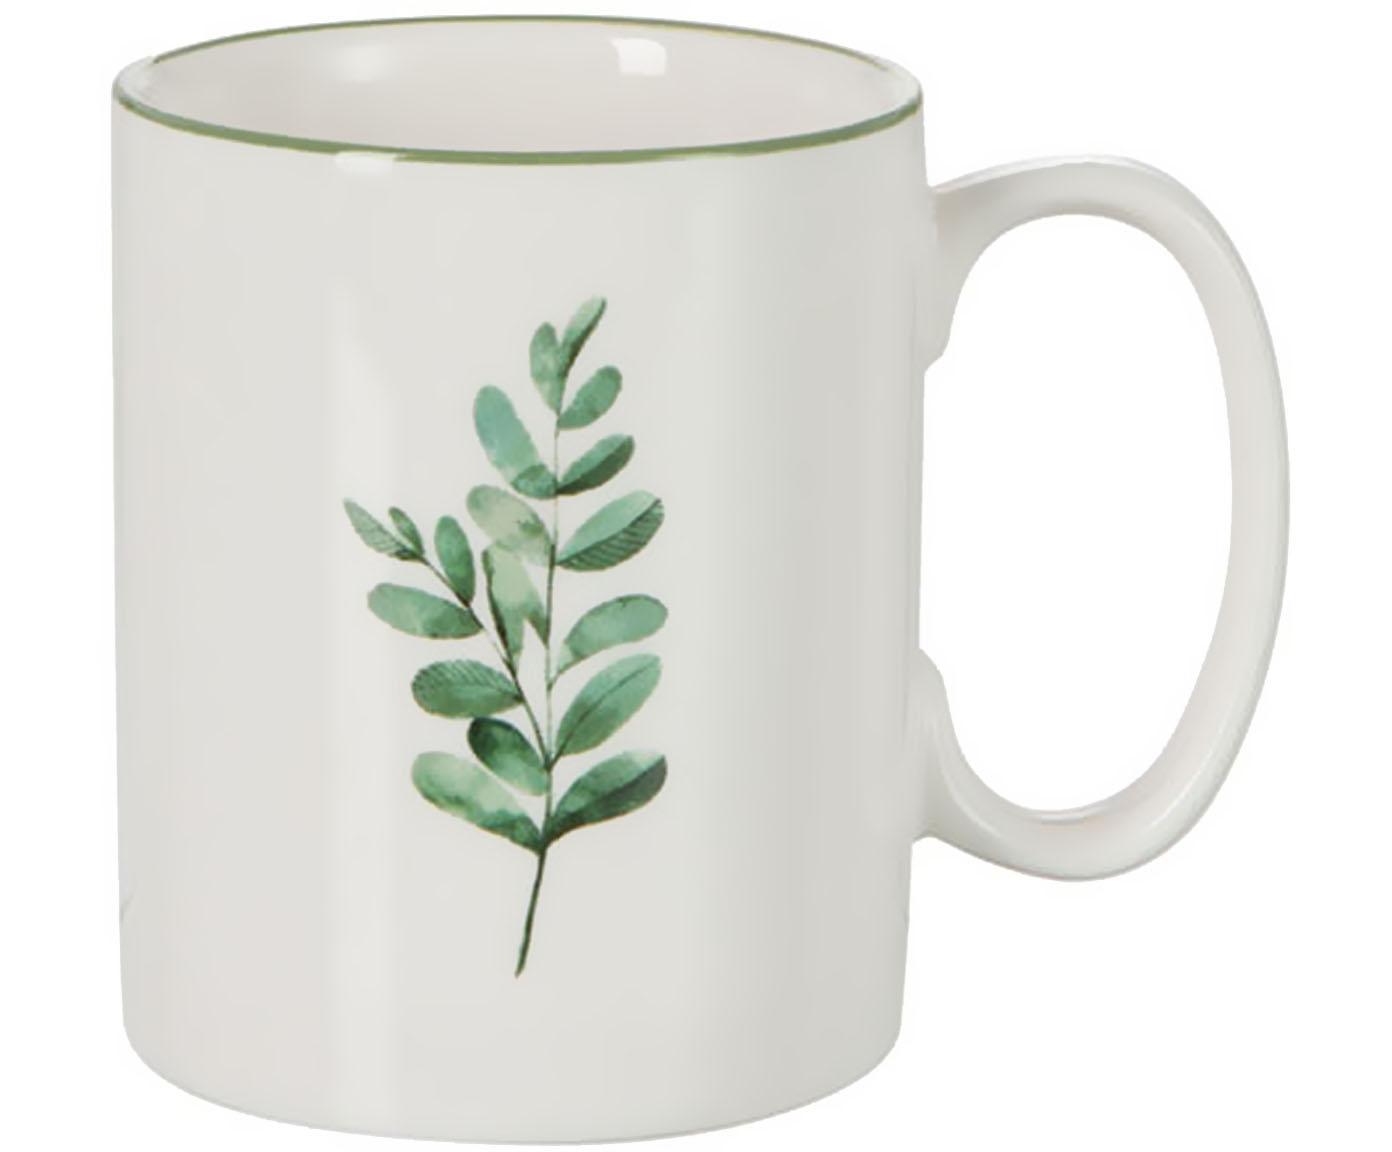 Tazza Eukalyptus, 6 pz., Porcellana, Bianco, verde, Ø 8 cm